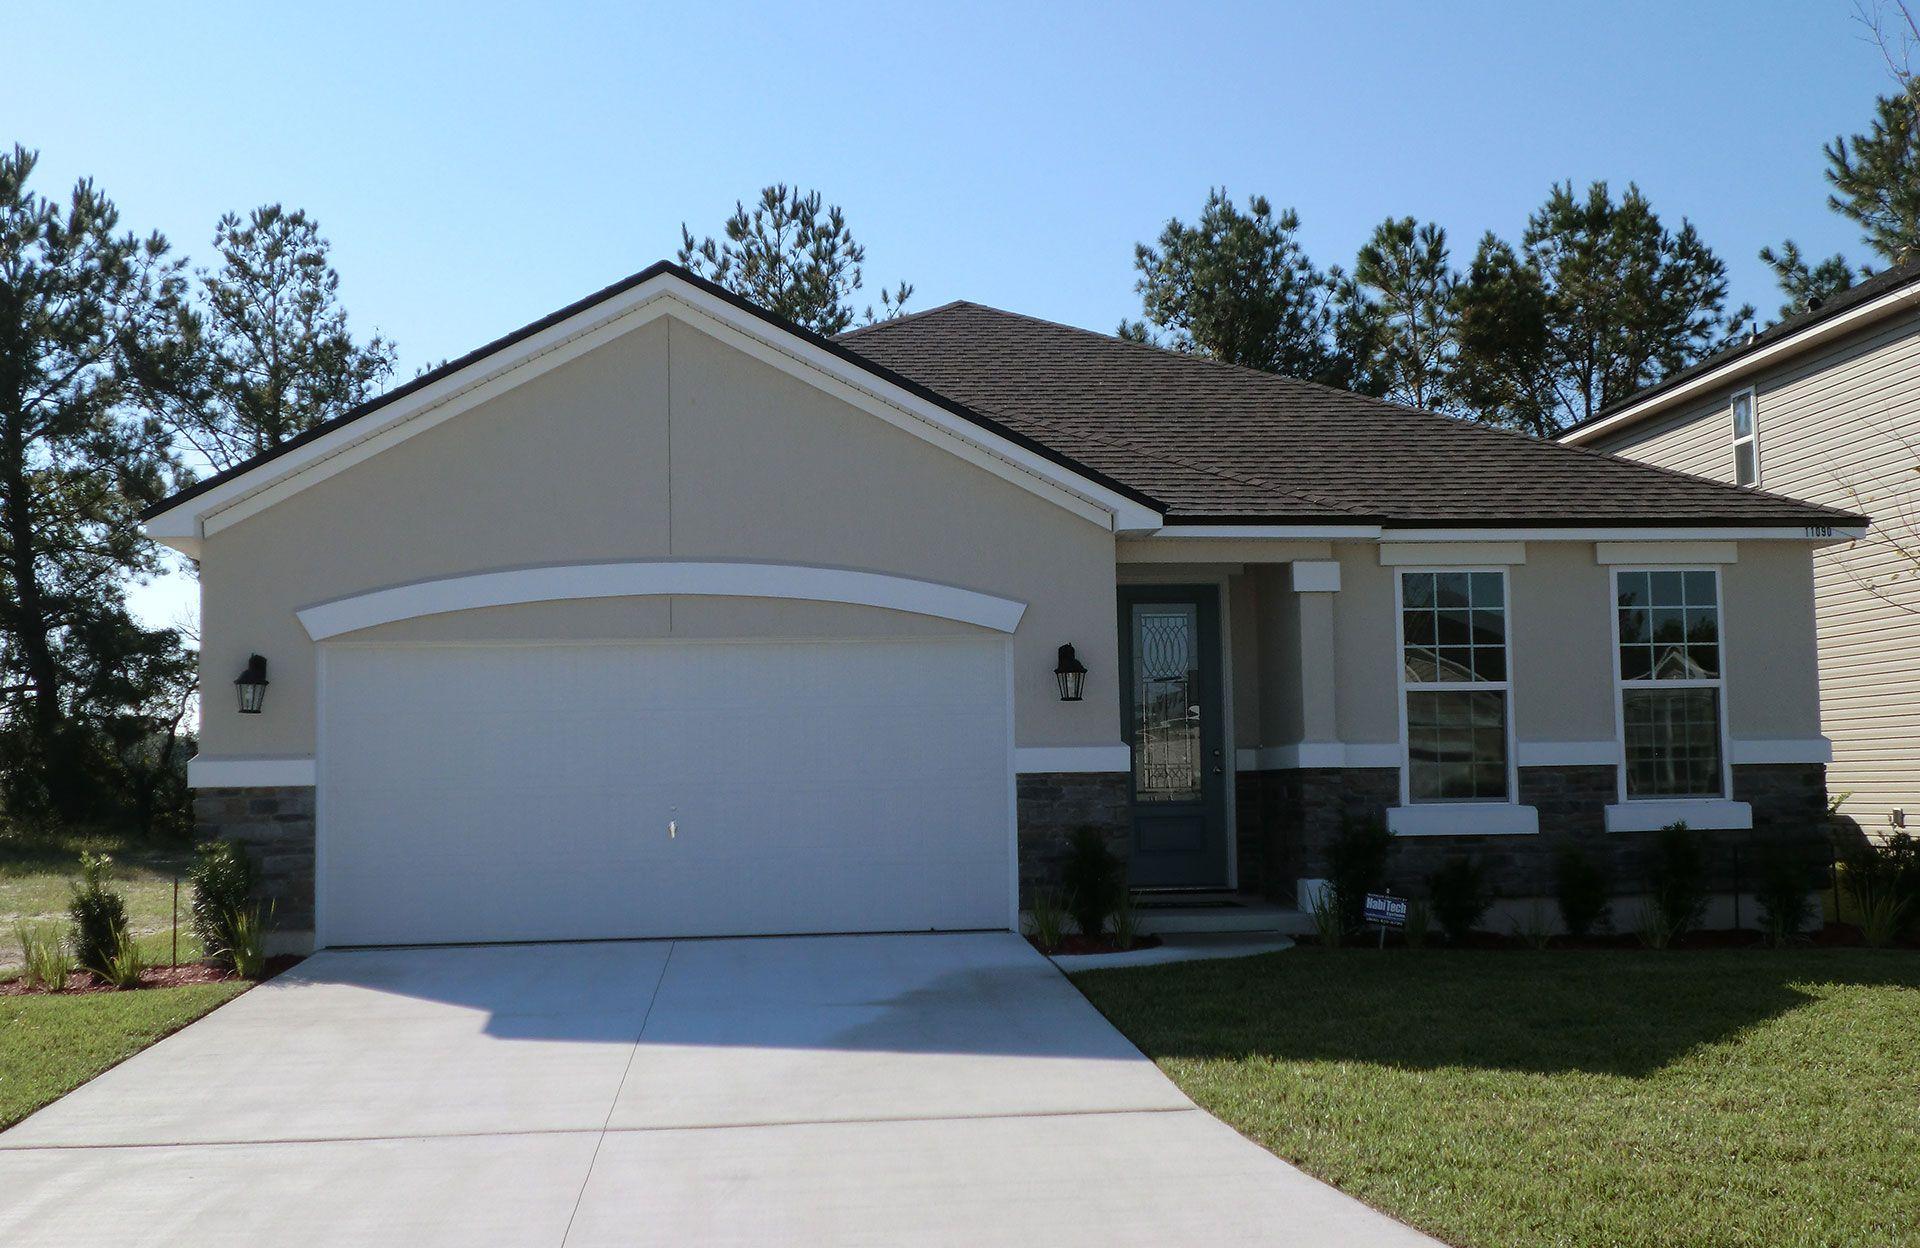 Photo of Hilton in Jacksonville, FL 32221